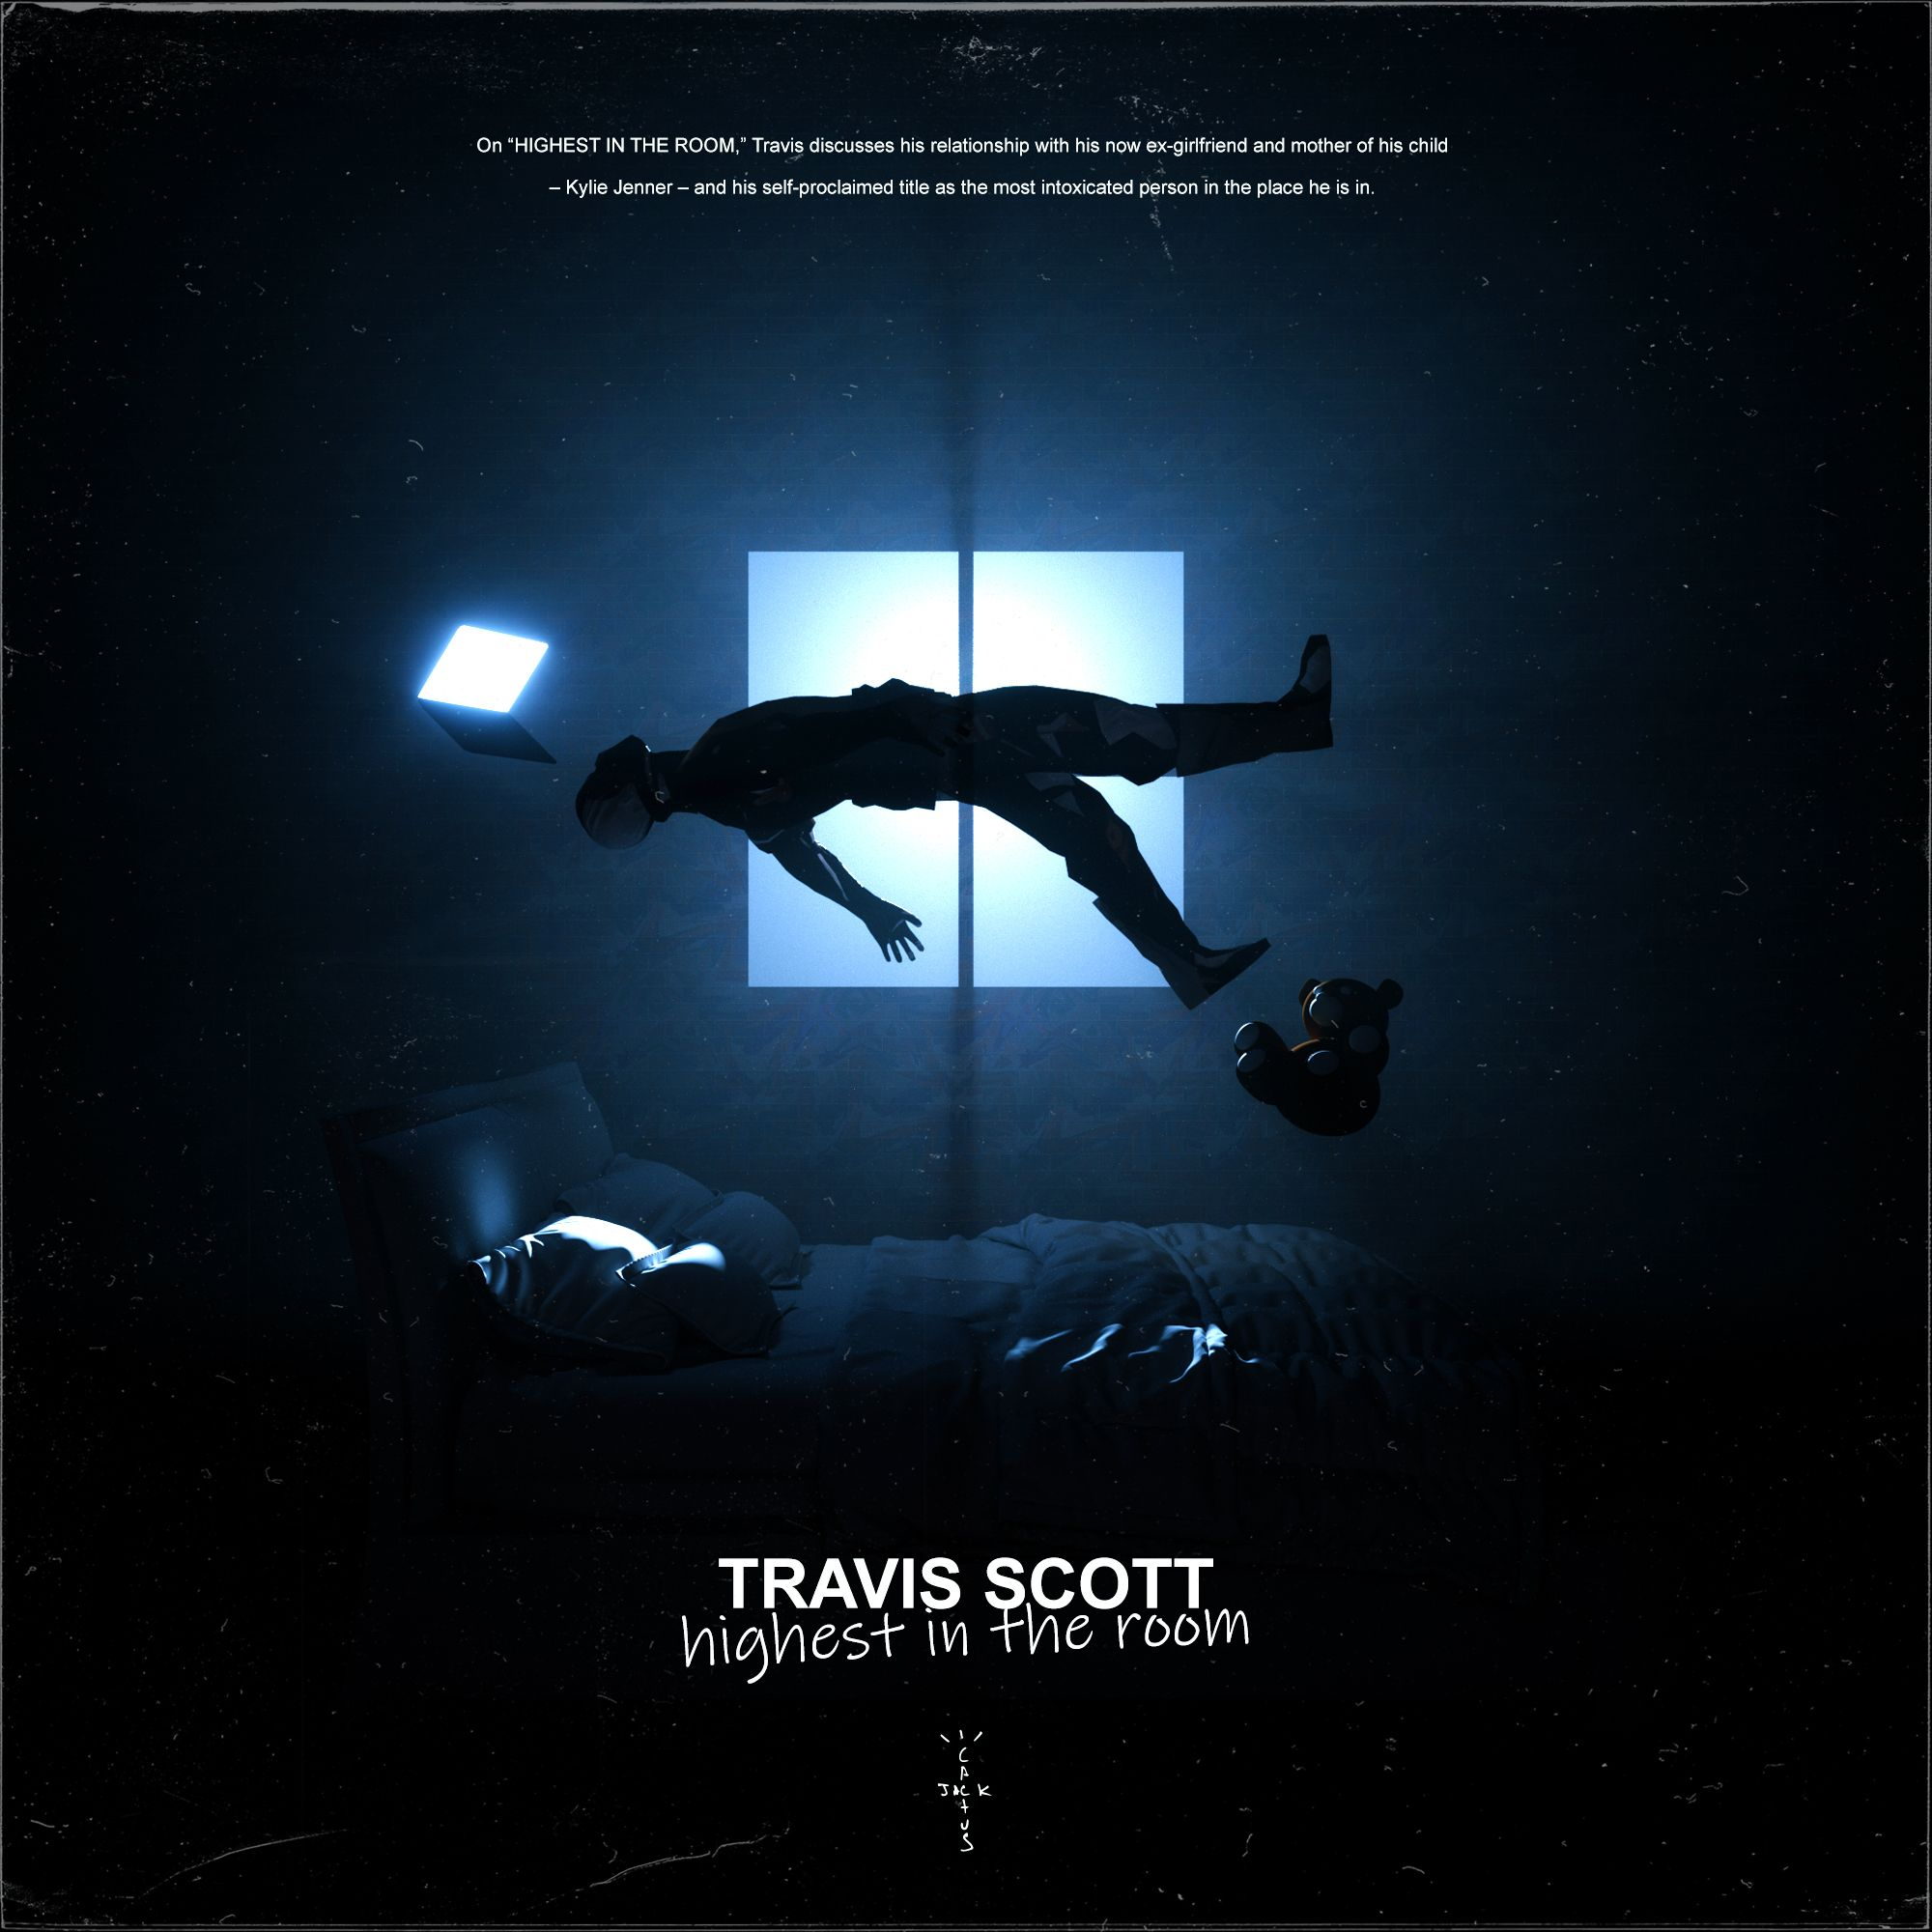 Travis Scott Highest In The Room 3d Render Alternative Cover By Jeroenbreevoort Travis Scott Wallpapers Travis Scott Travis Scott Album